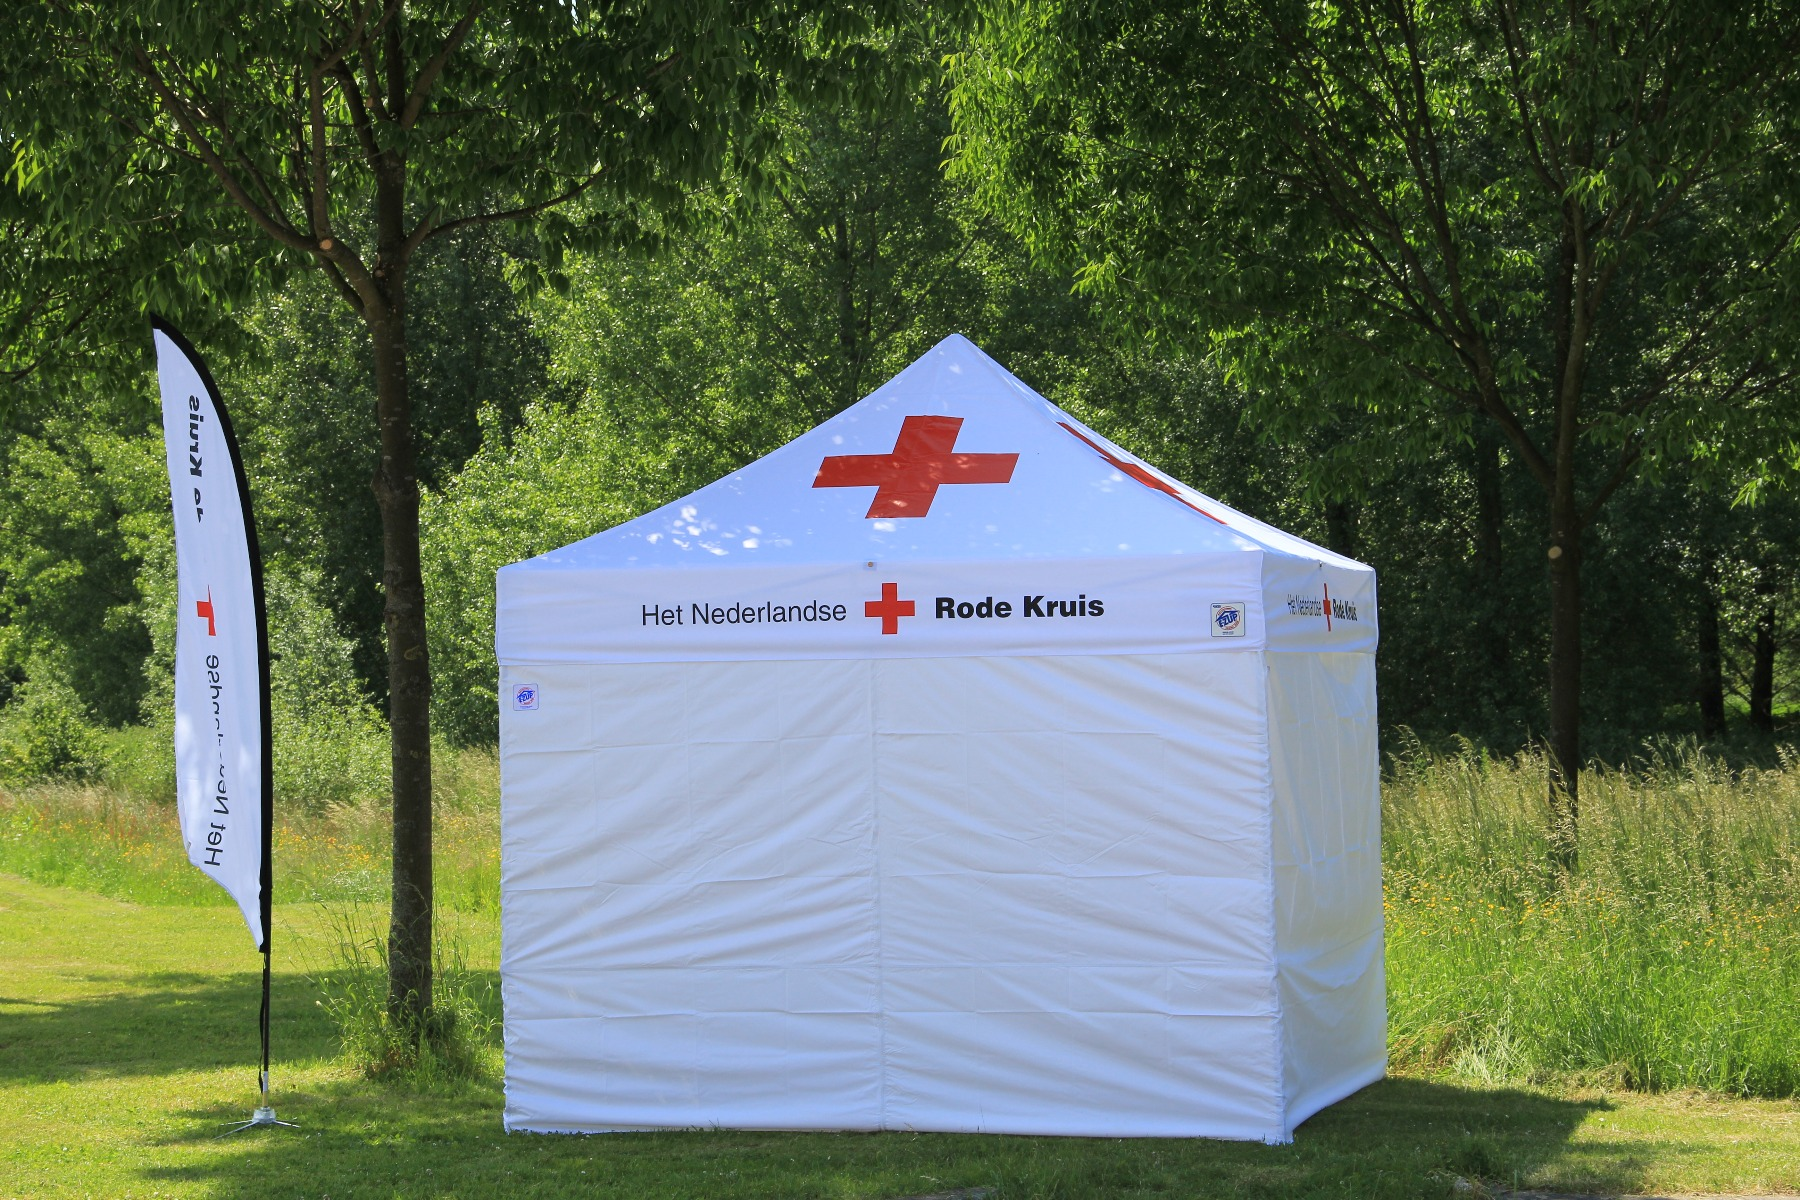 Red Cross Nederland by E-Z UP